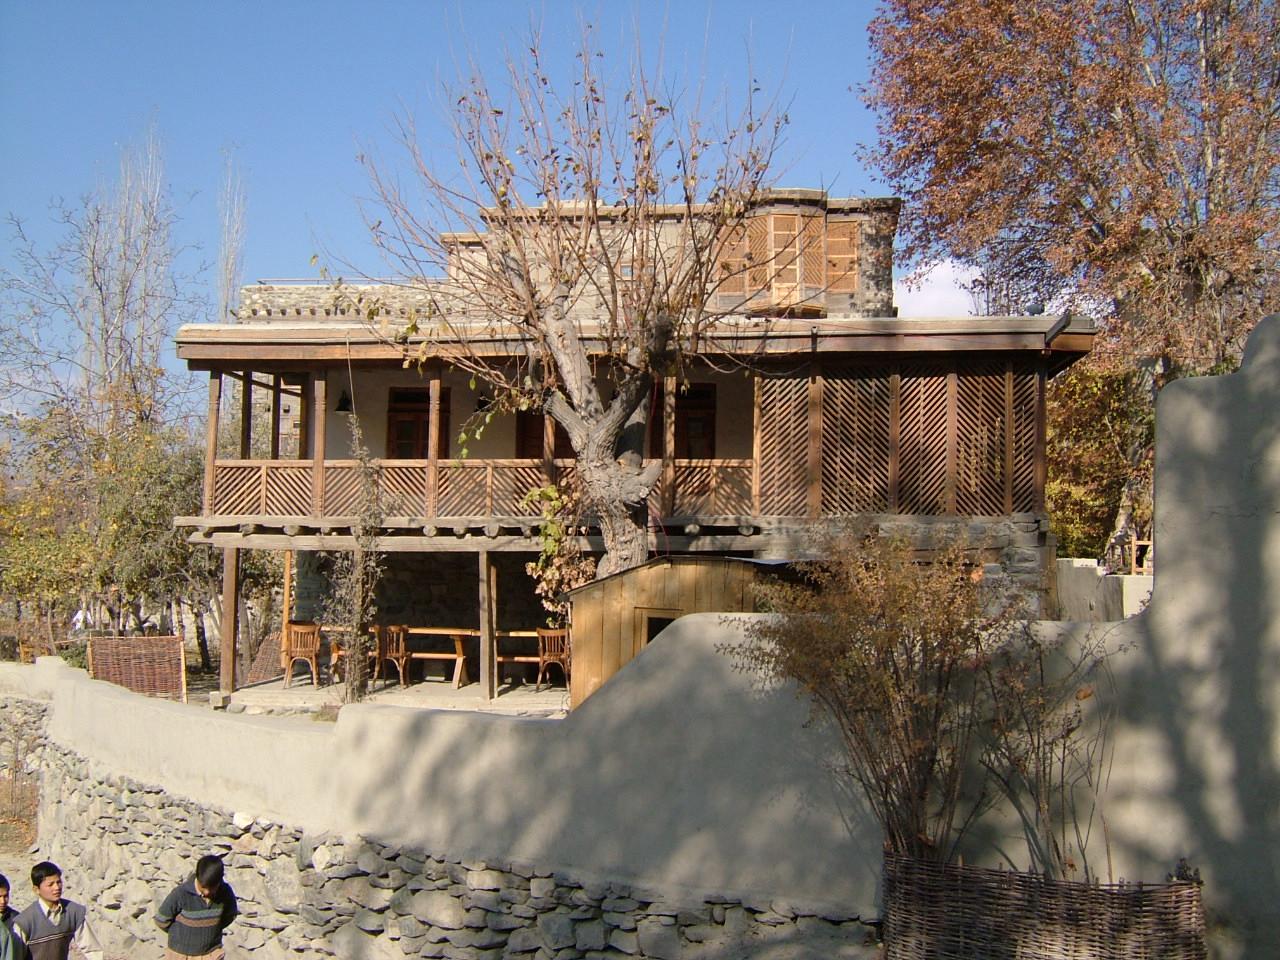 2049847142 b227bbd0a3 o - Shigar Fort Residence Baltitstan